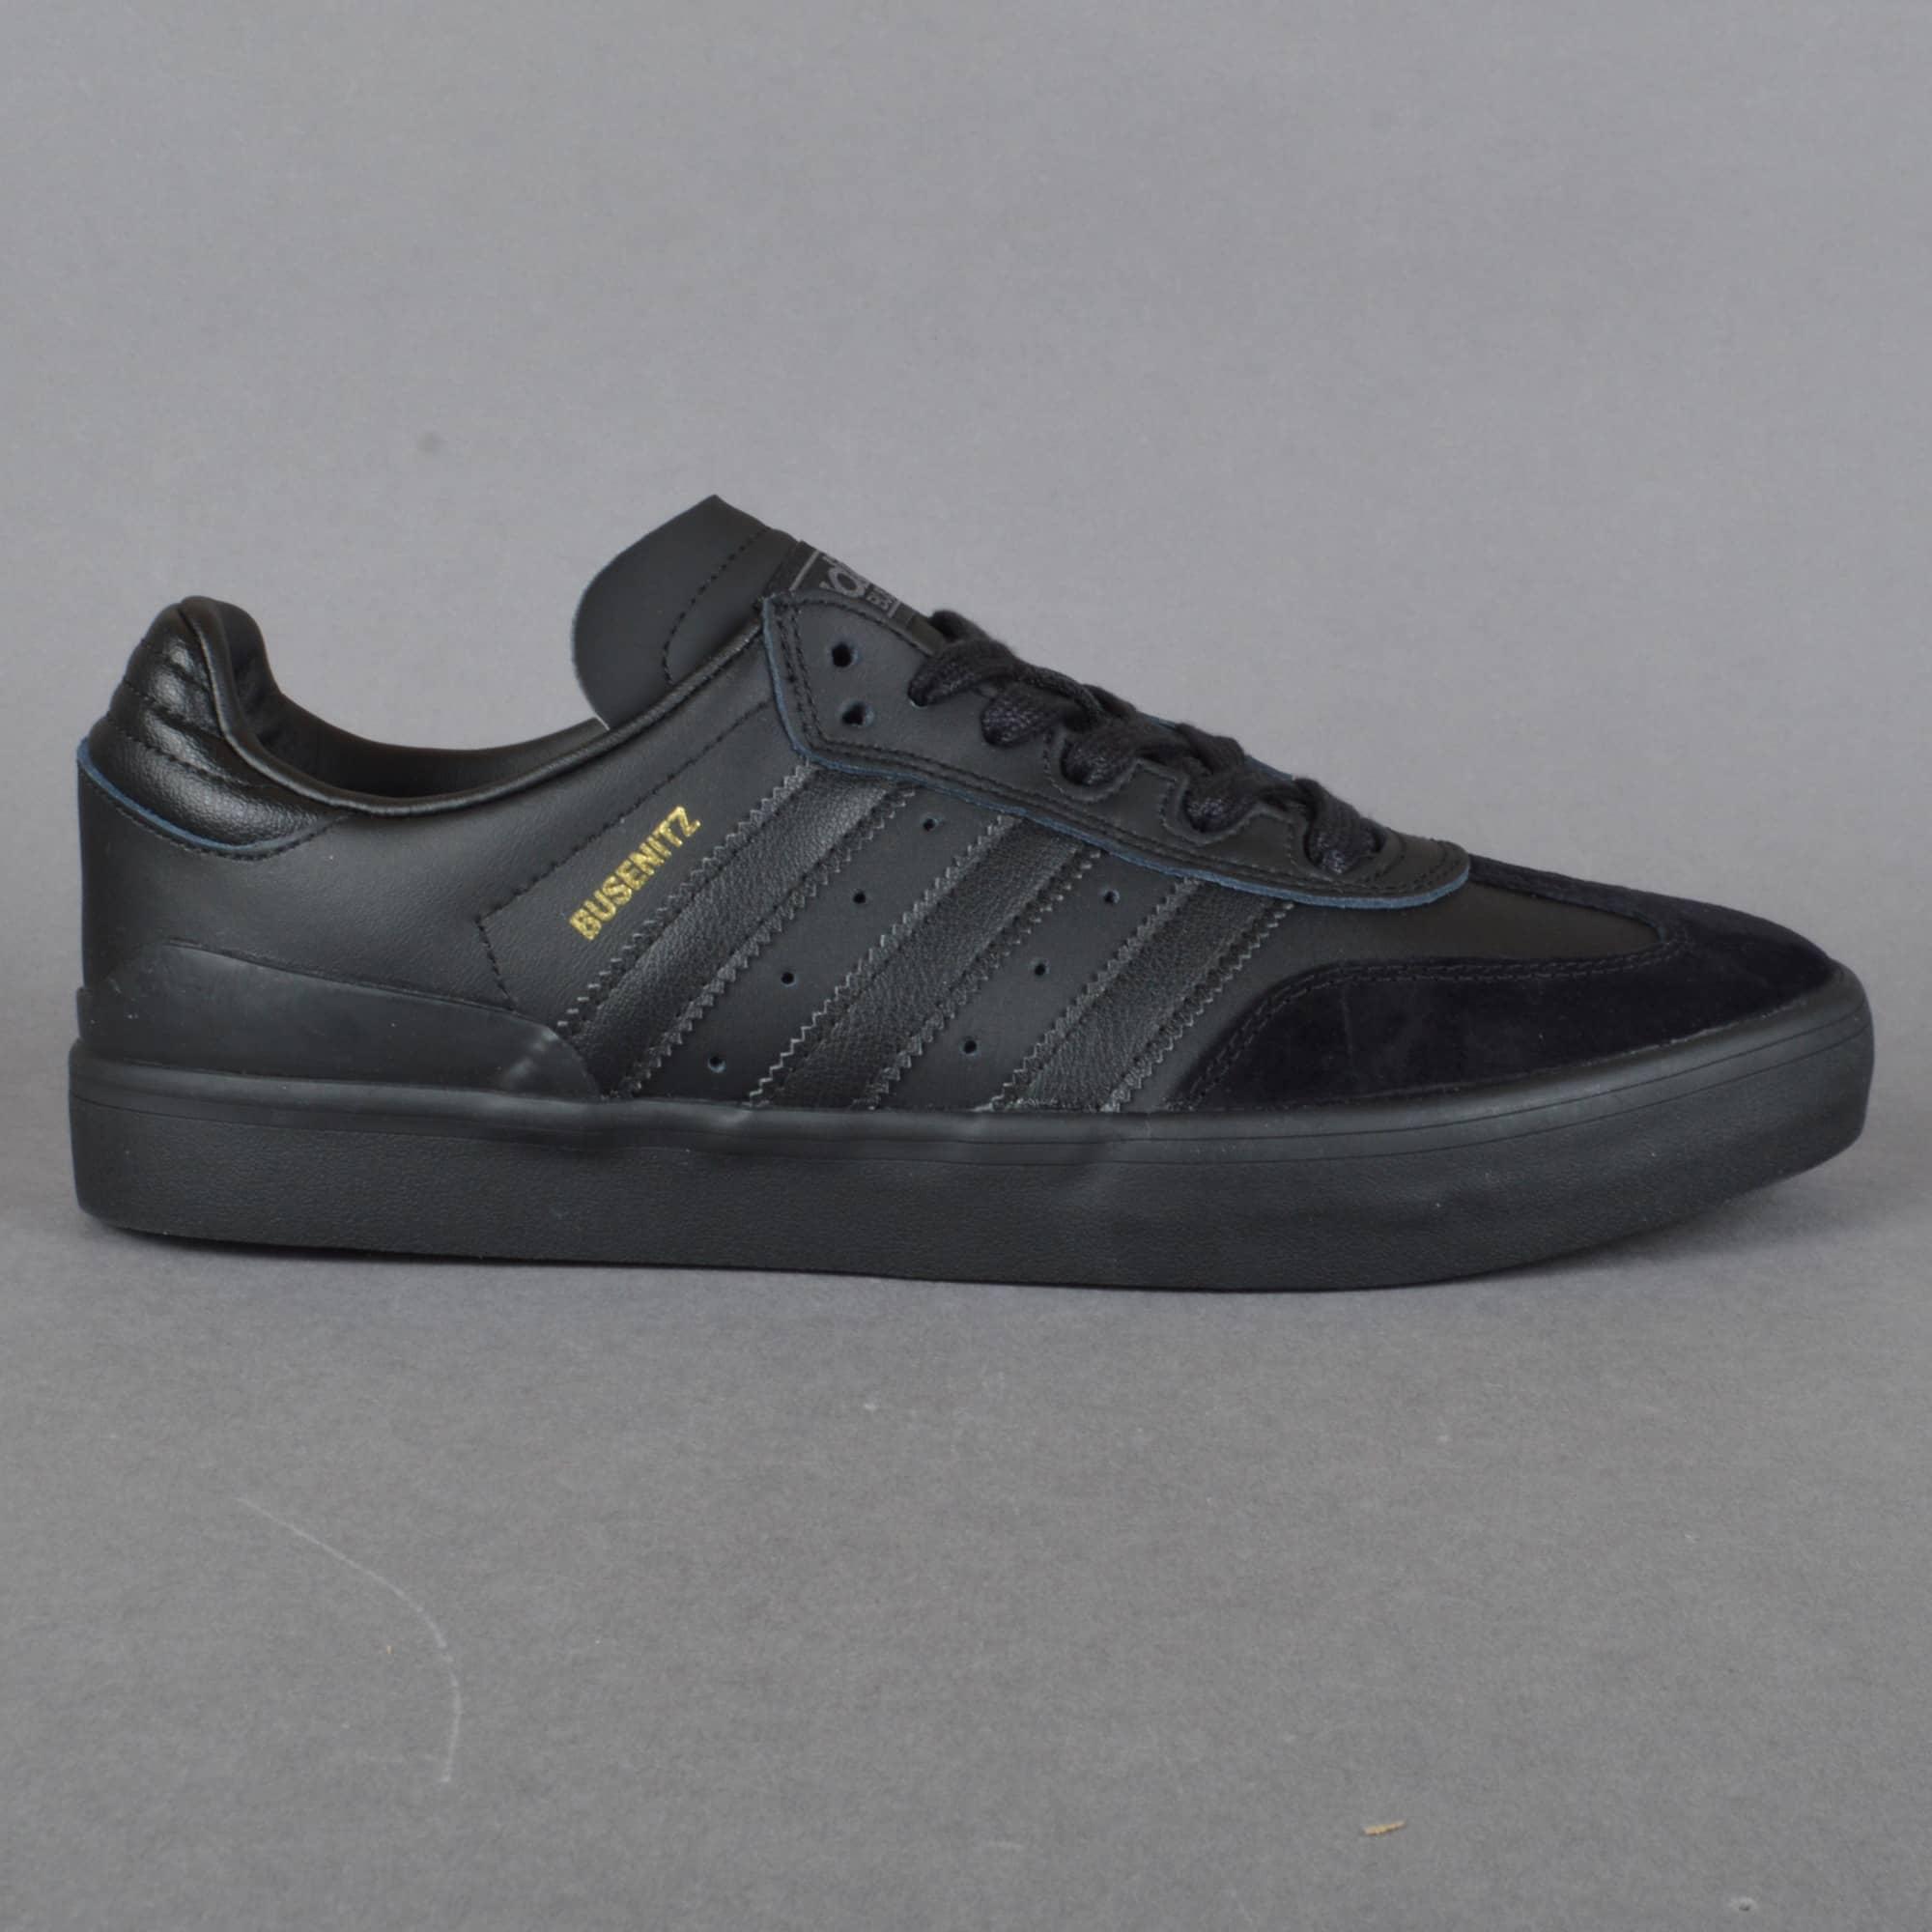 Adidas Skateboarding Busenitz Vulc Samba Edition Skate Shoes -  CBLACK/CBLACK/GRDEDG - SKATE SHOES from Native Skate Store UK